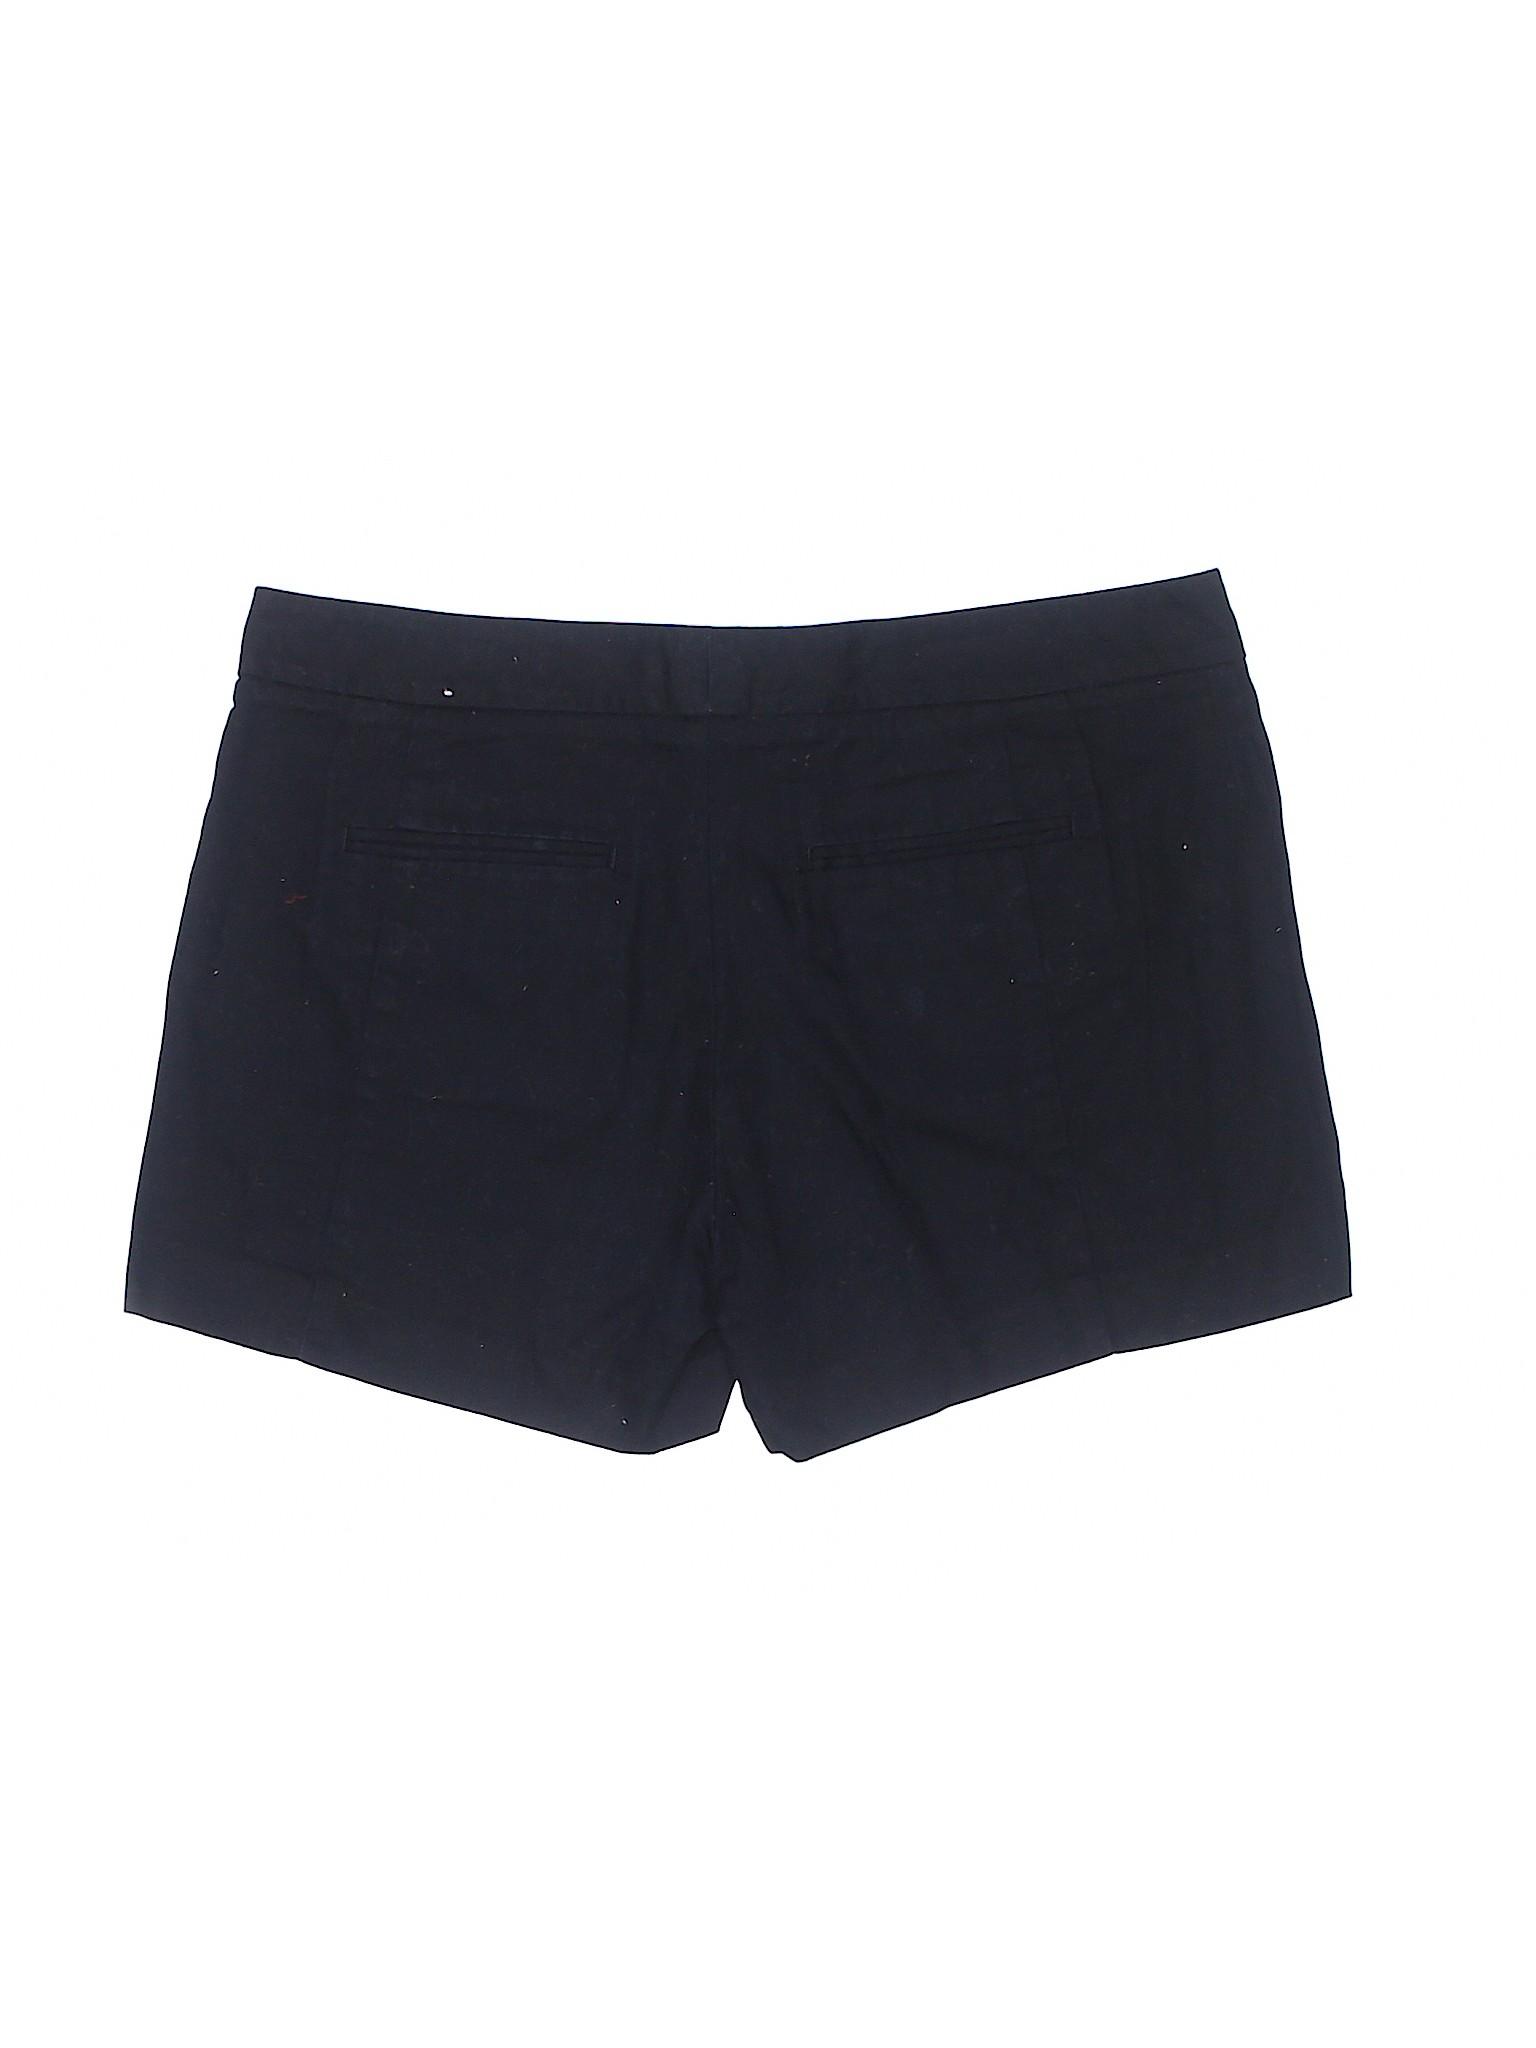 Khaki Boutique Gap Shorts Khaki Gap Gap Boutique Boutique Shorts Boutique Shorts Khaki Shorts Khaki Boutique Gap Gap wHYzYqA7